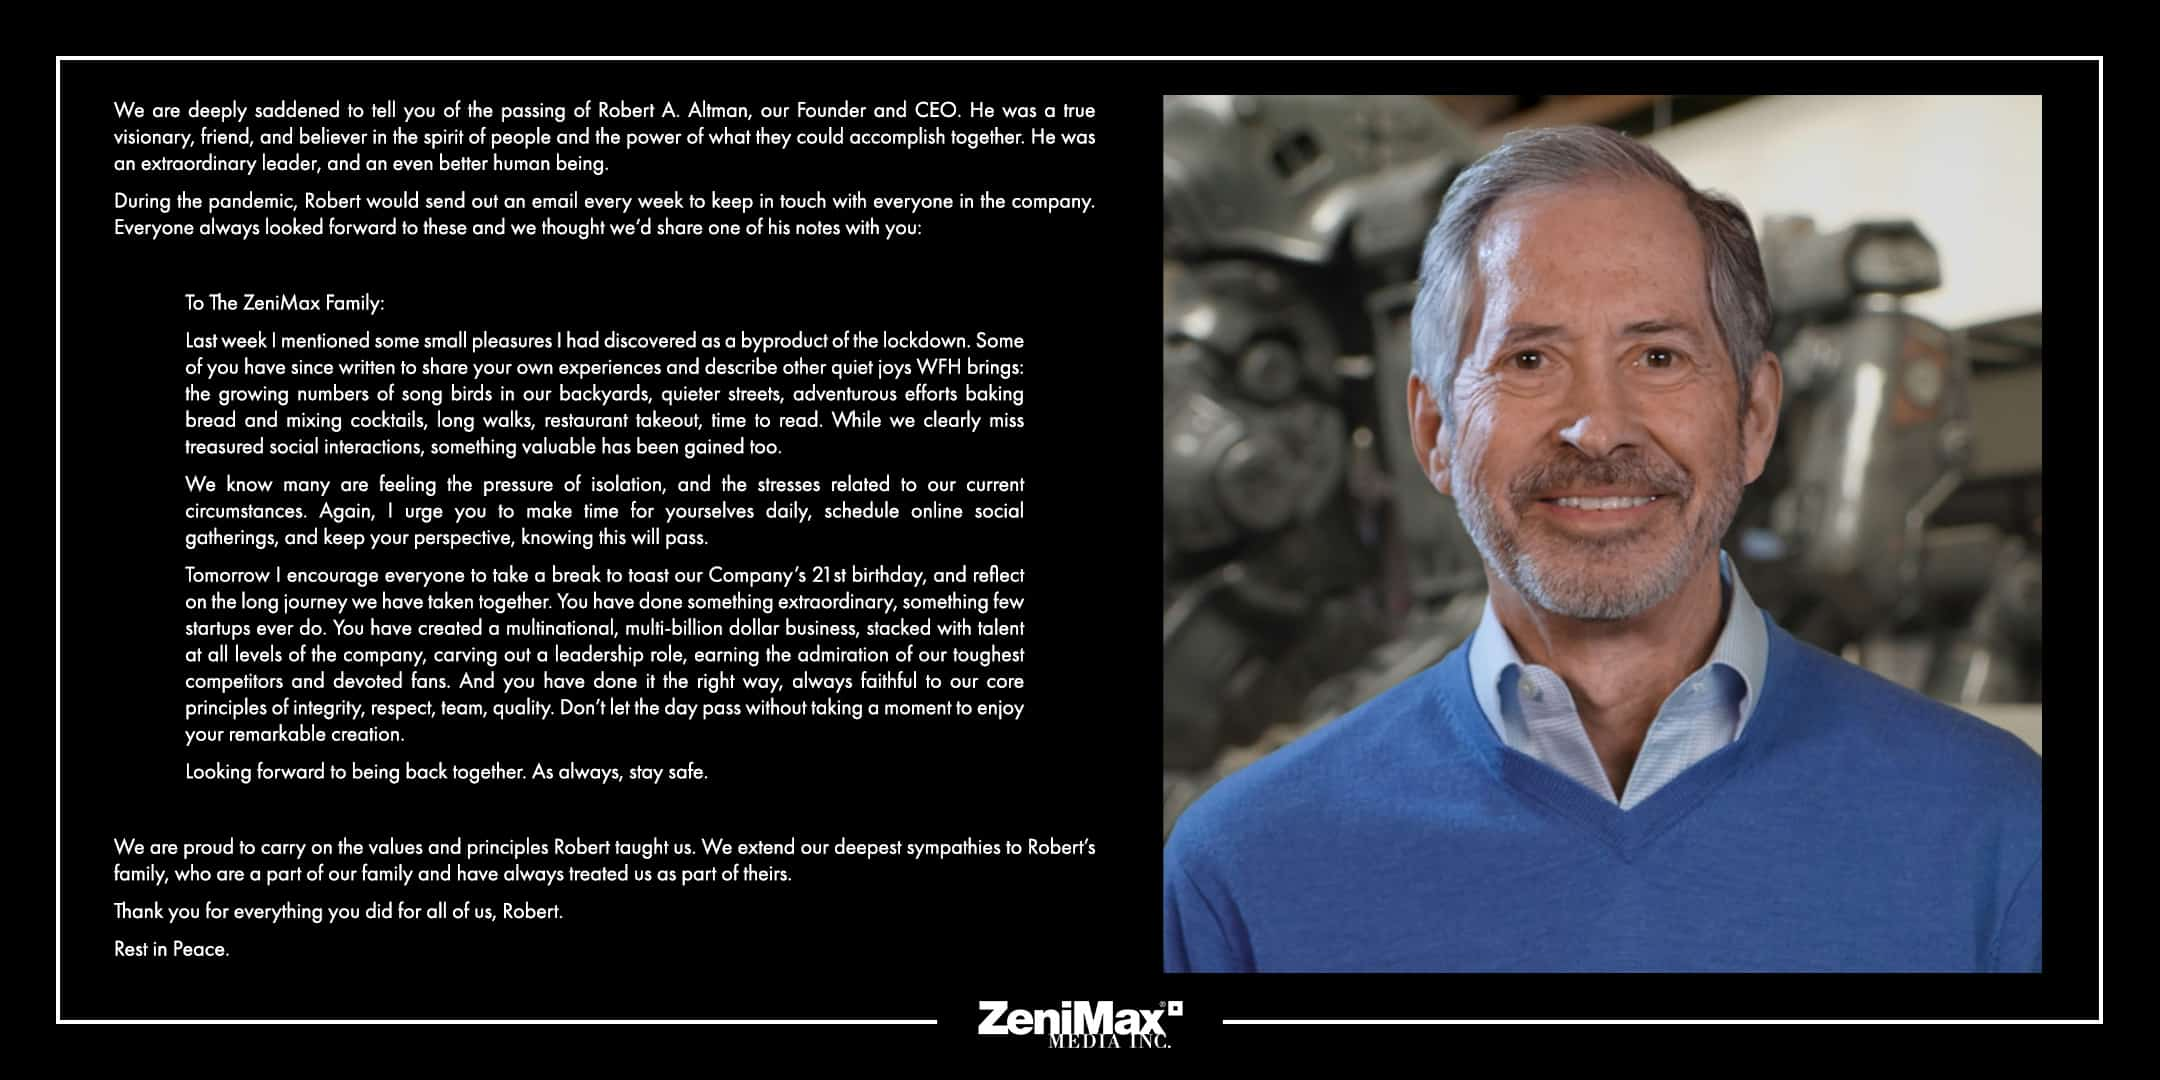 ZeniMax Media's Founder / CEO Robert A. Altman Passes Away At 73 5